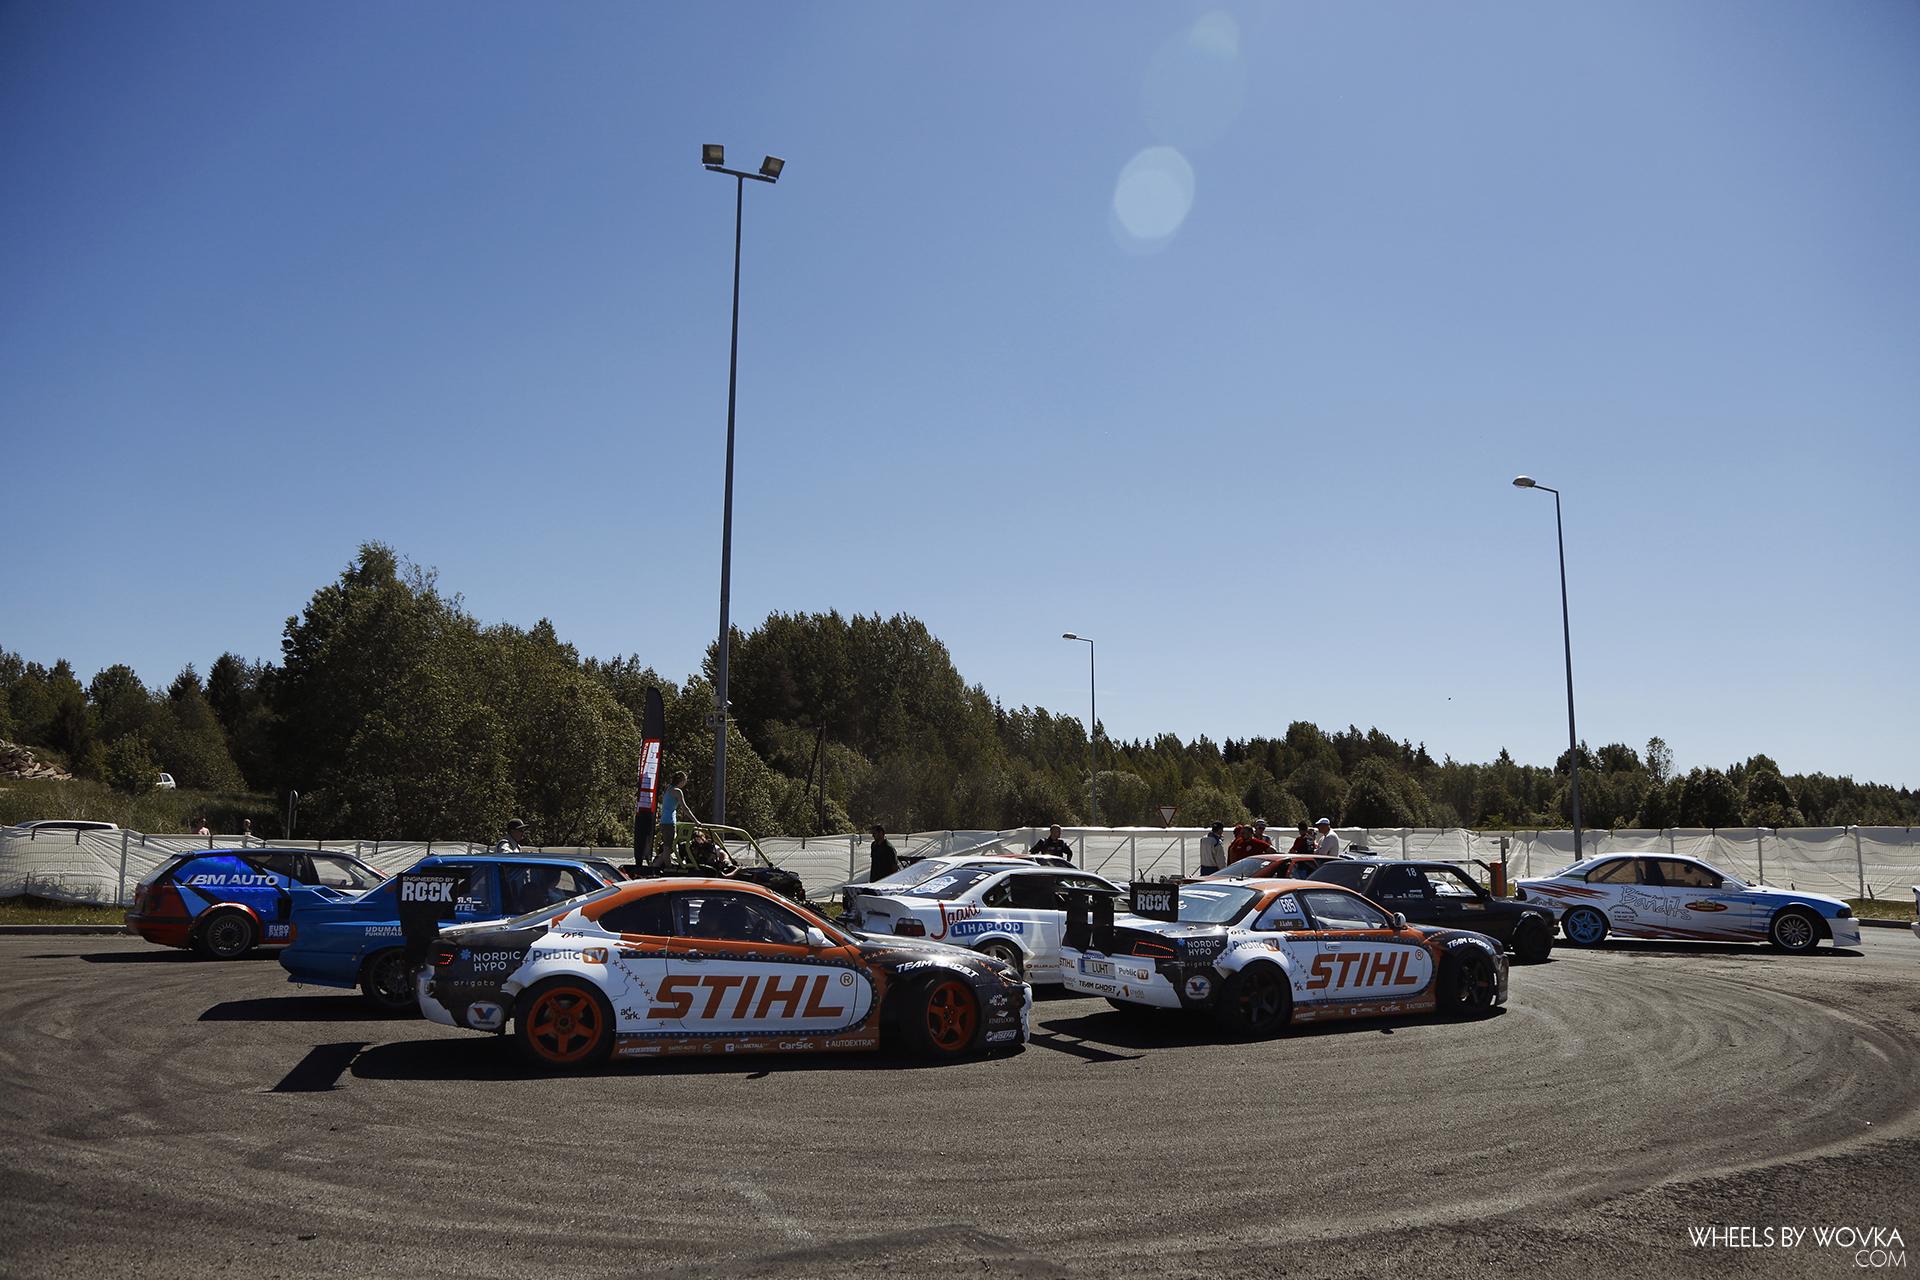 drift cars prepare for parade